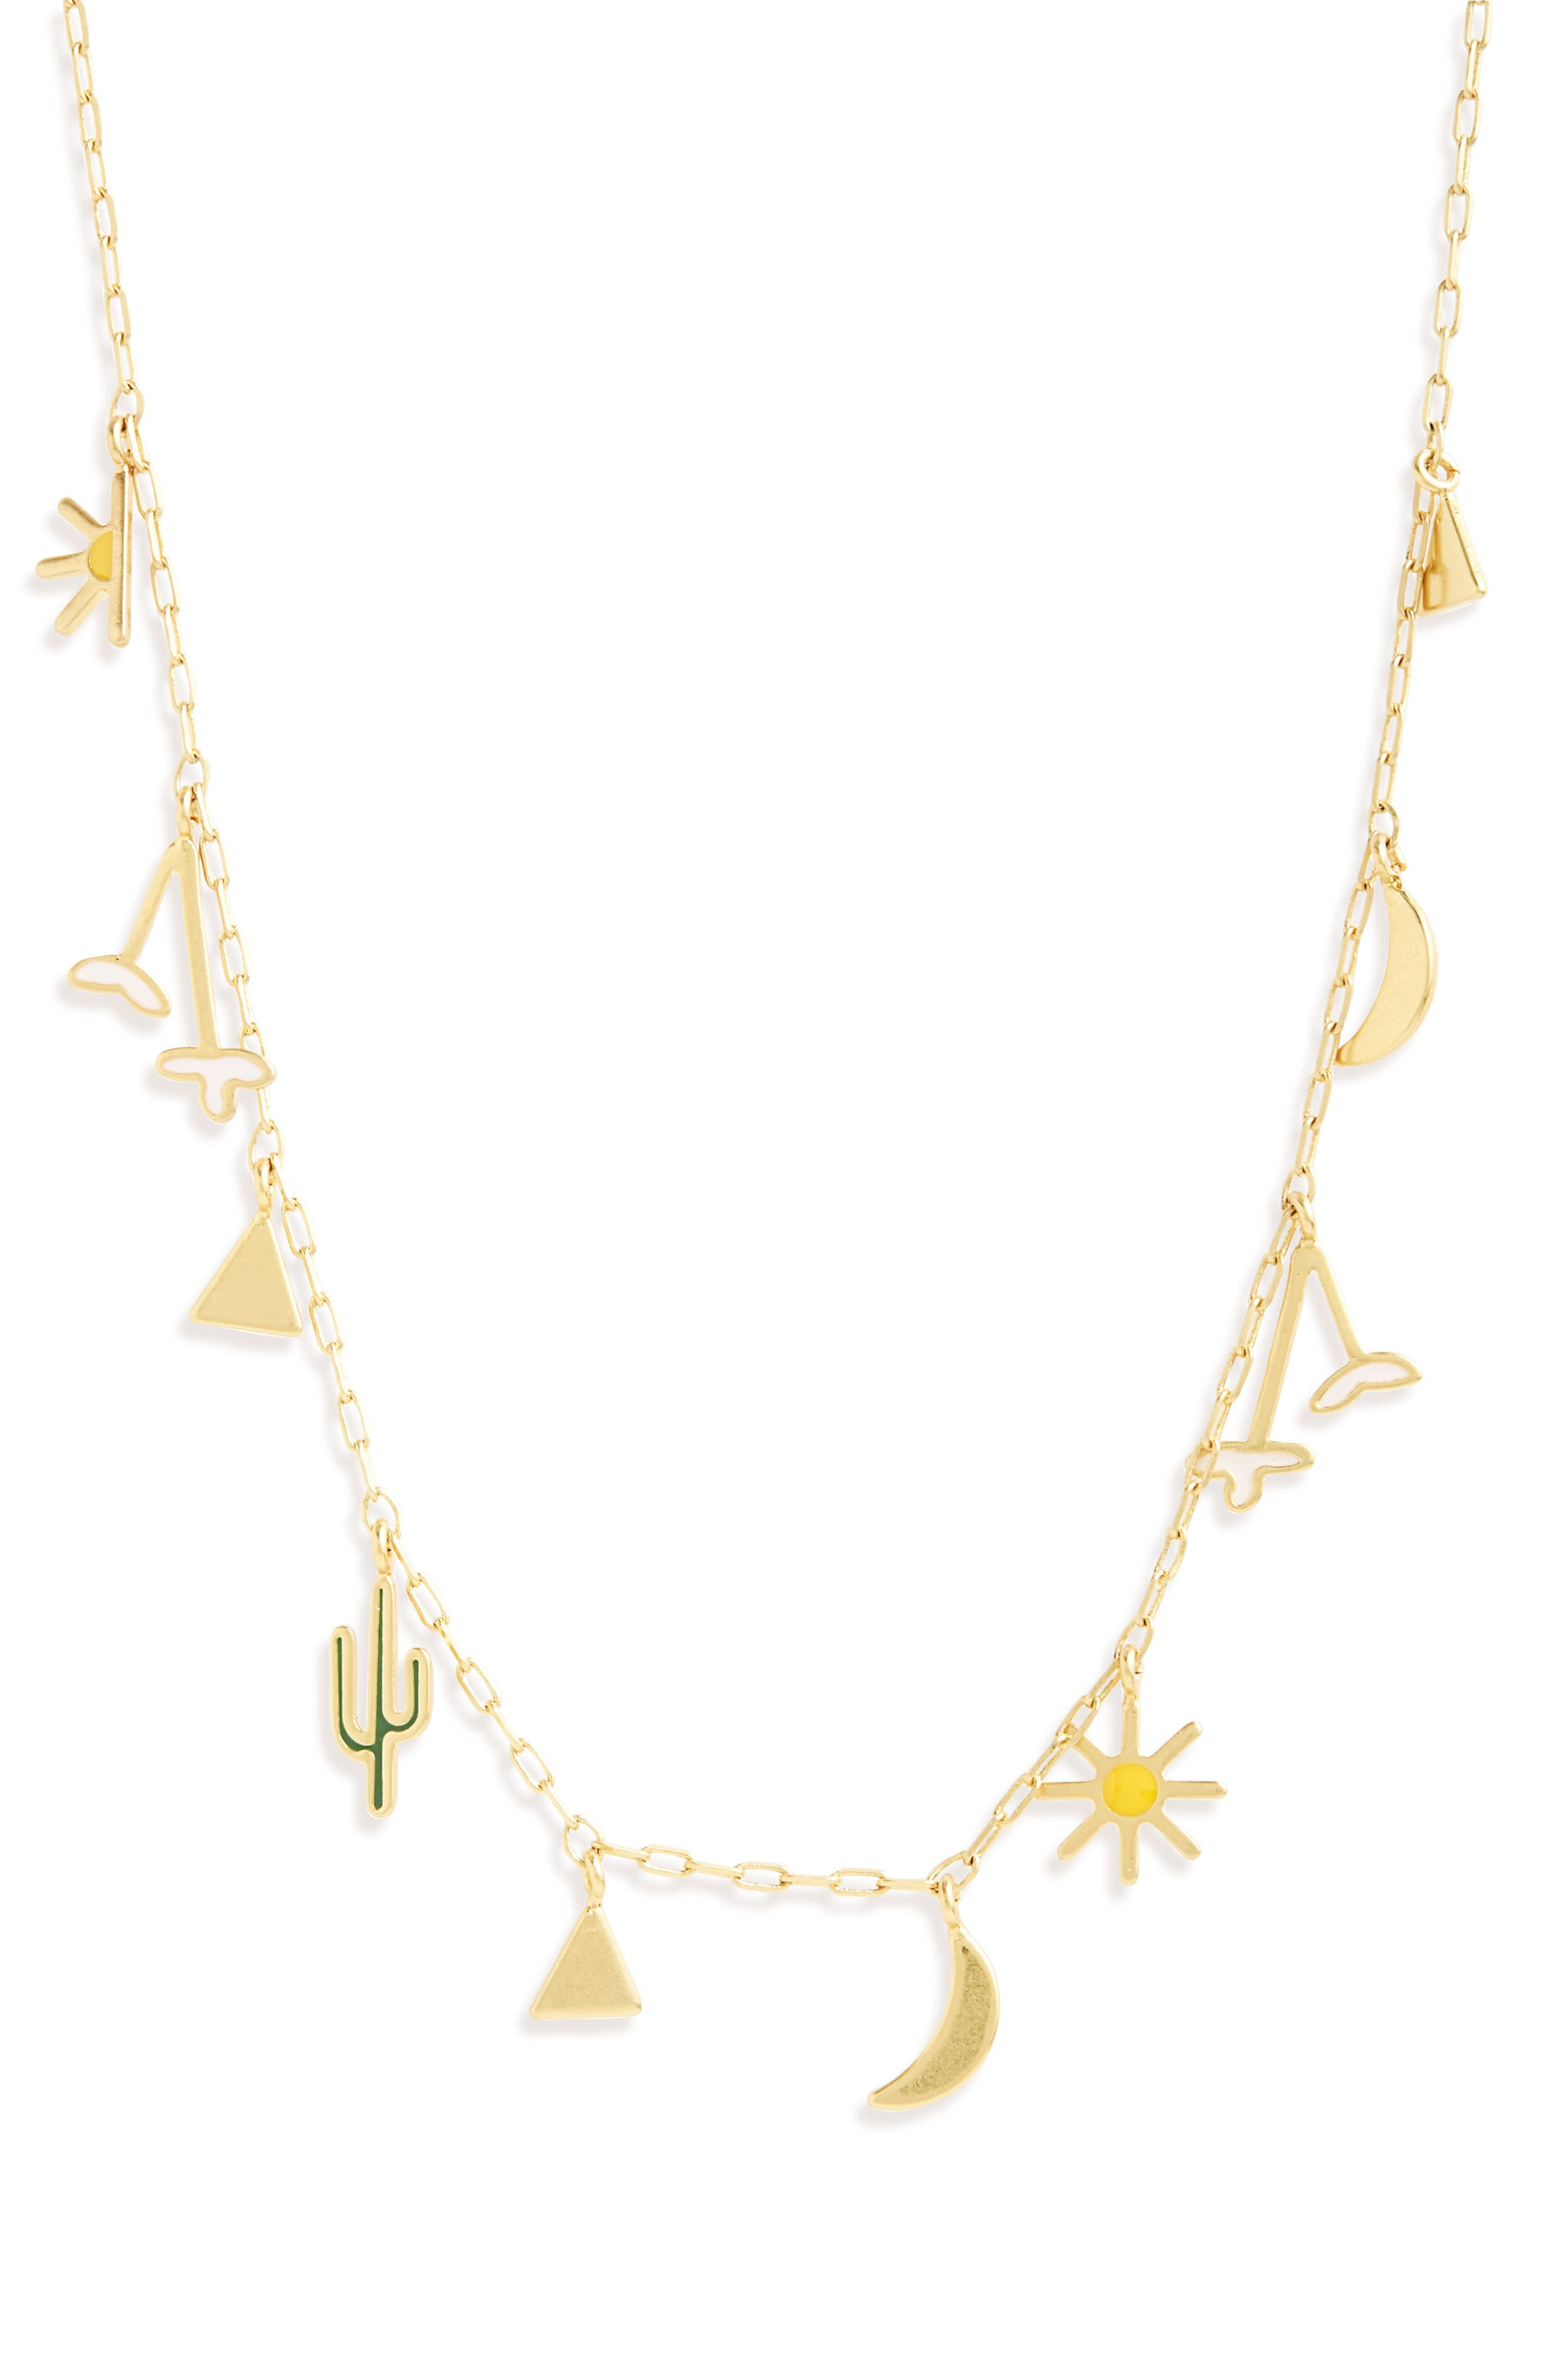 Primal Charm Necklace,                         Main,                         color, Vintage Gold